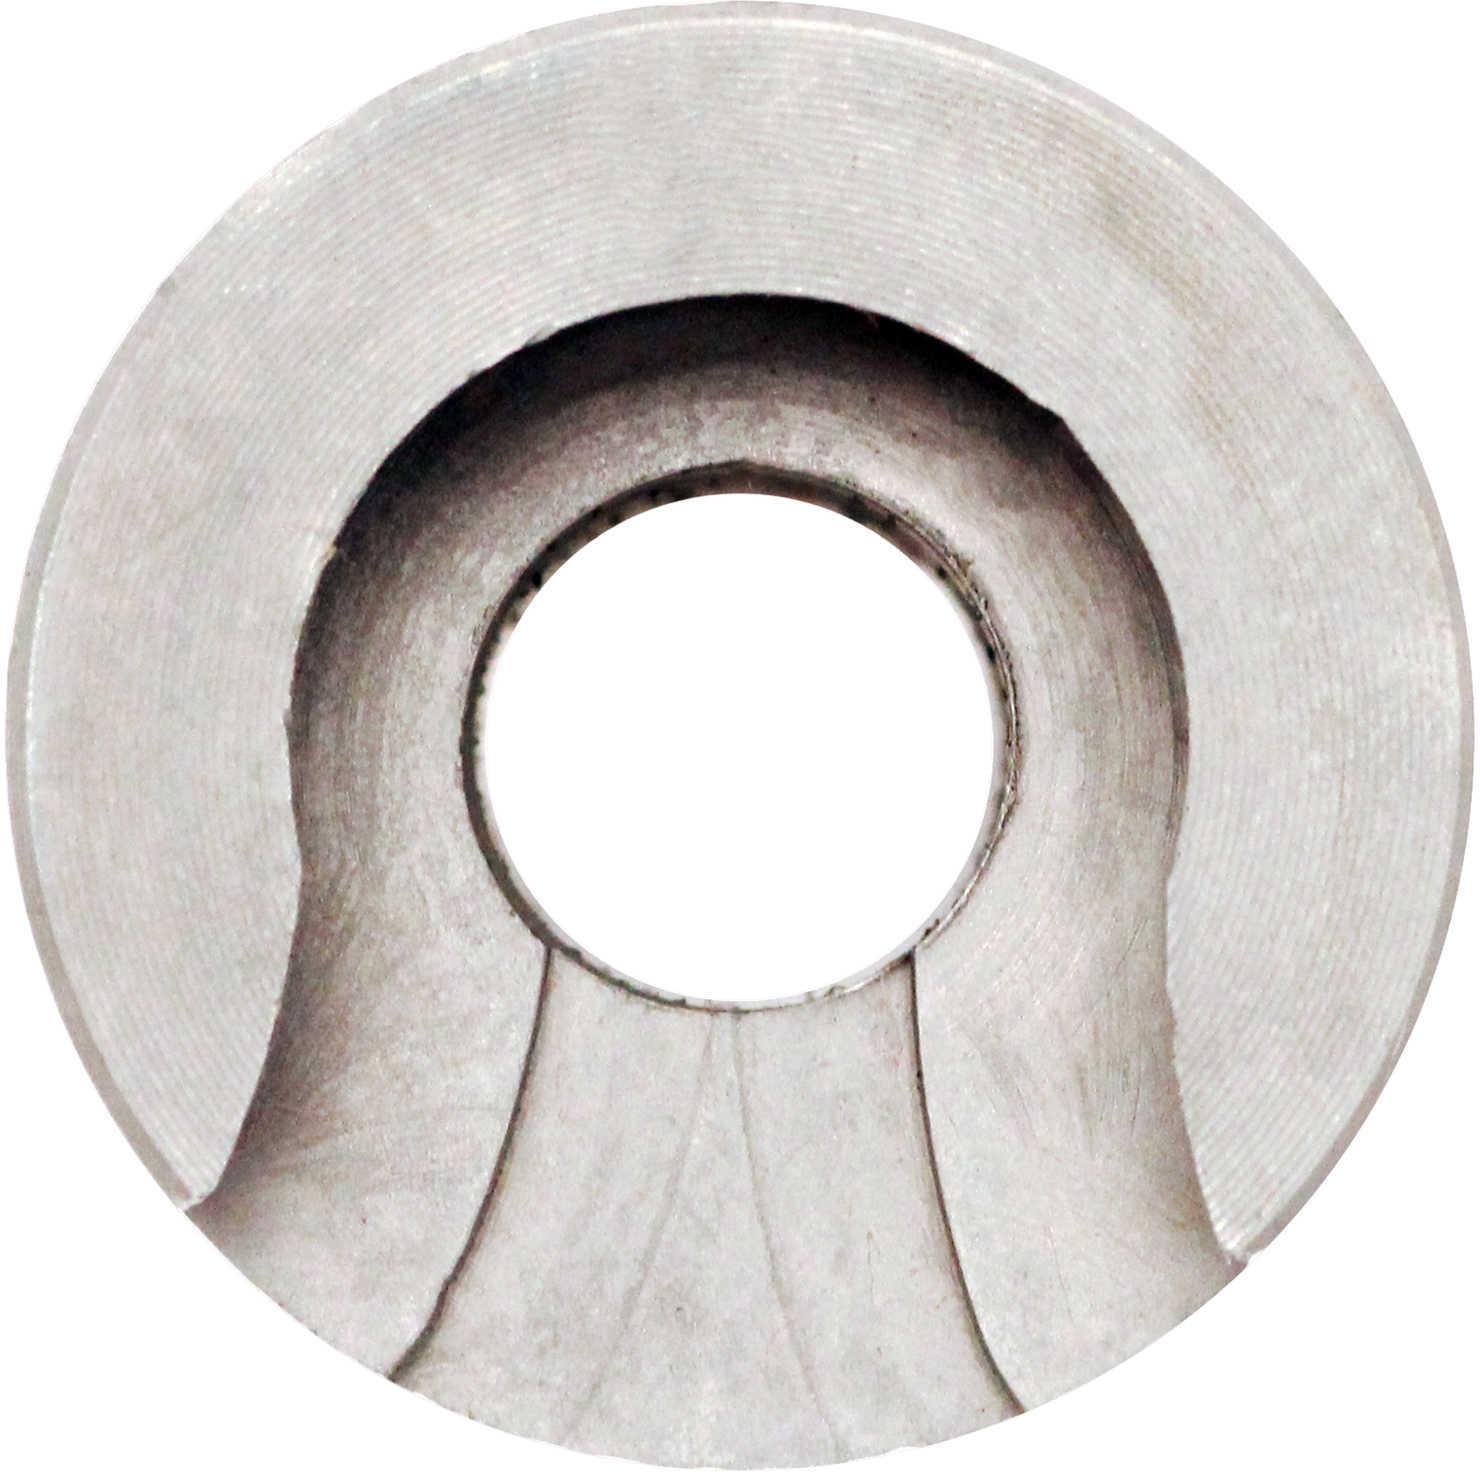 Hornady Shell Holder Size 20 Md: 390560